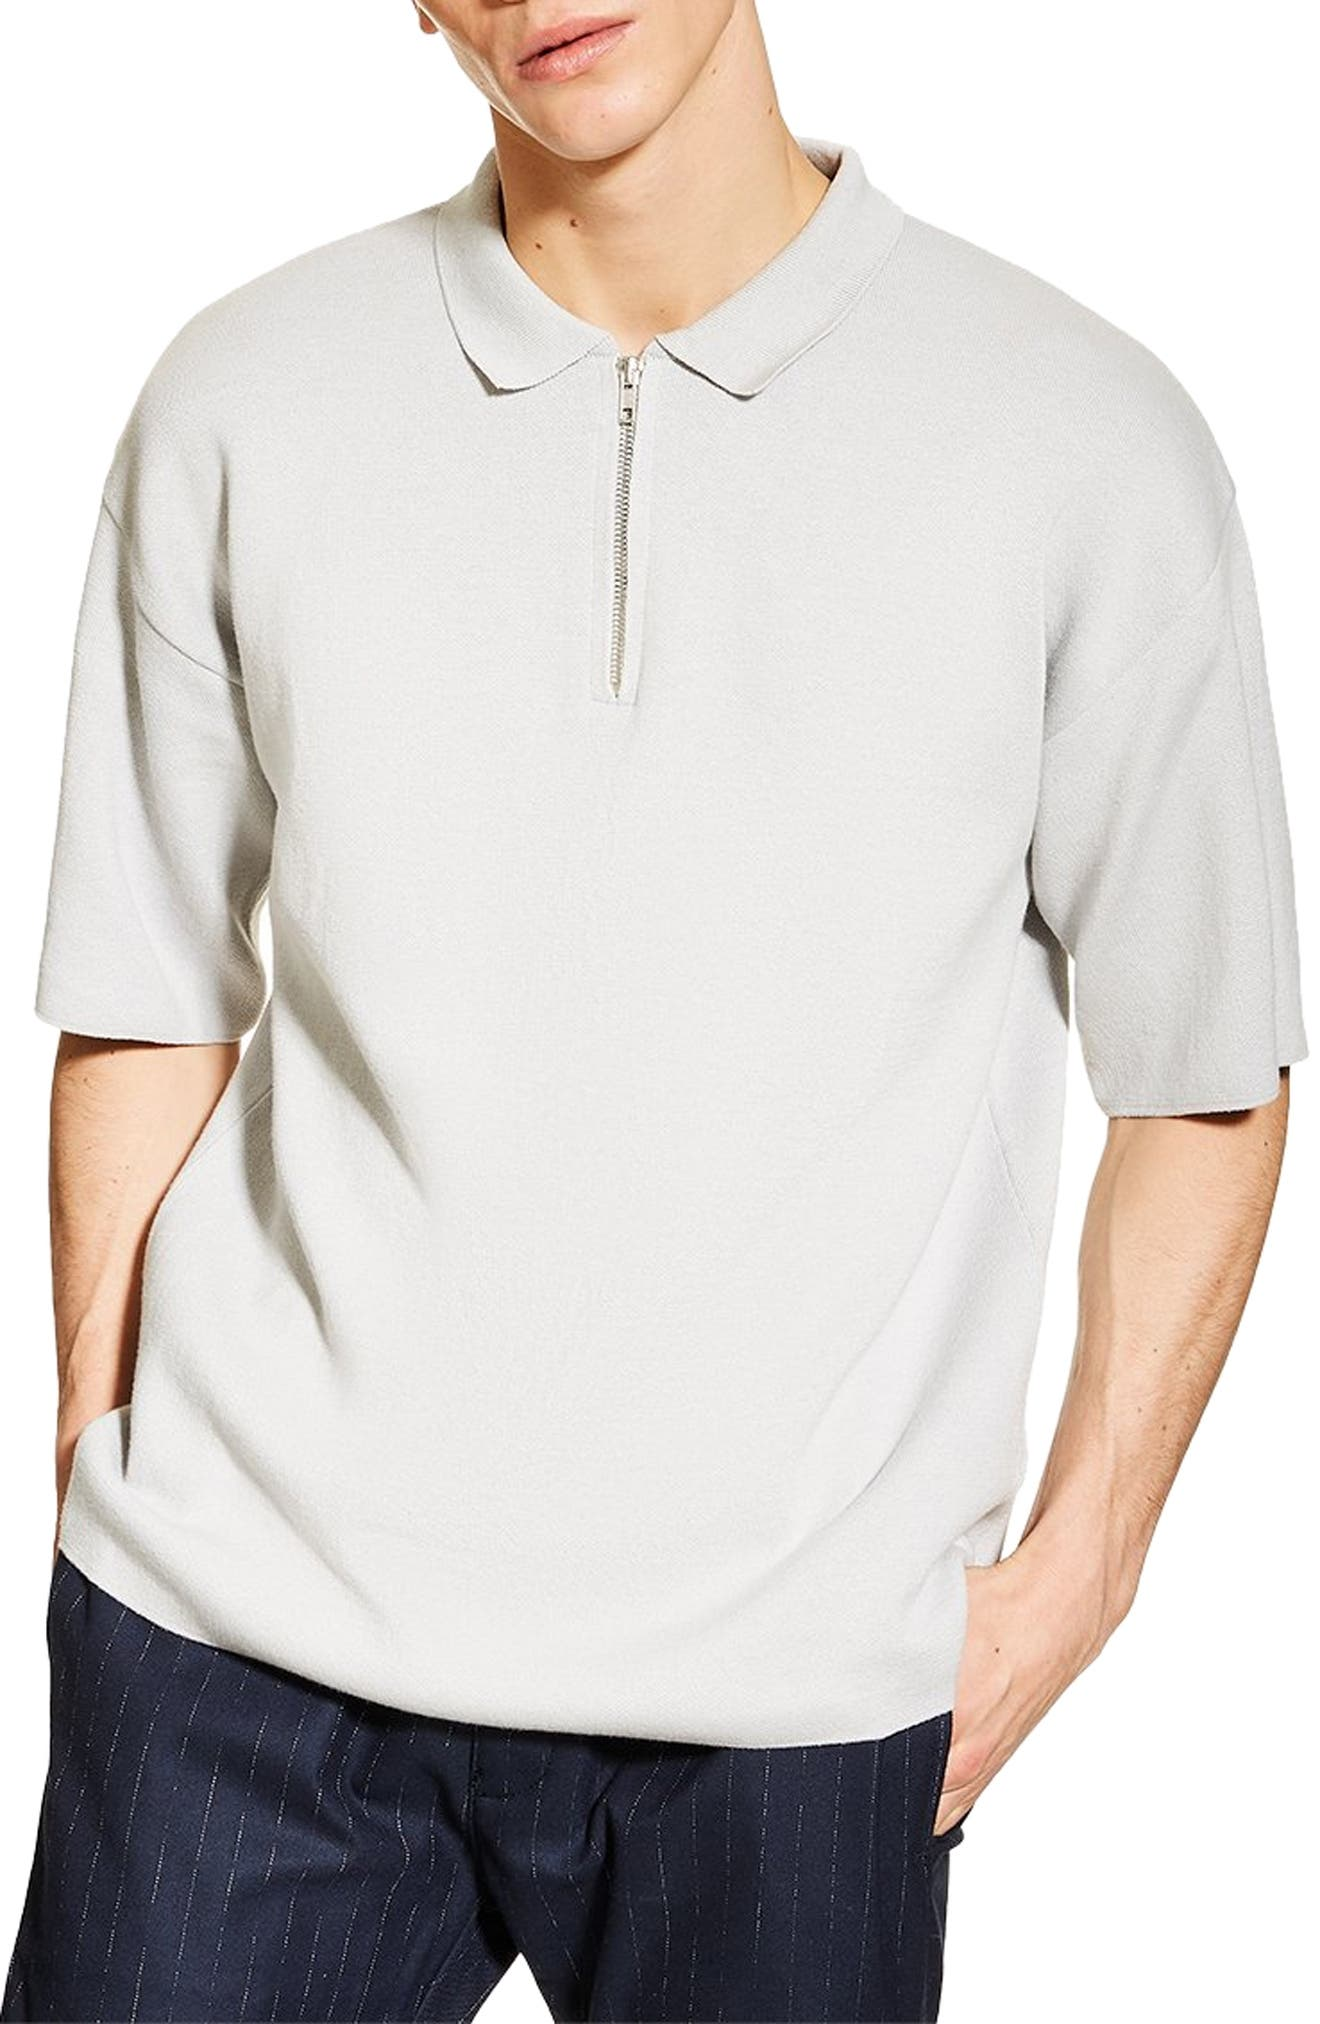 Topman Sweater Knit Polo, Grey